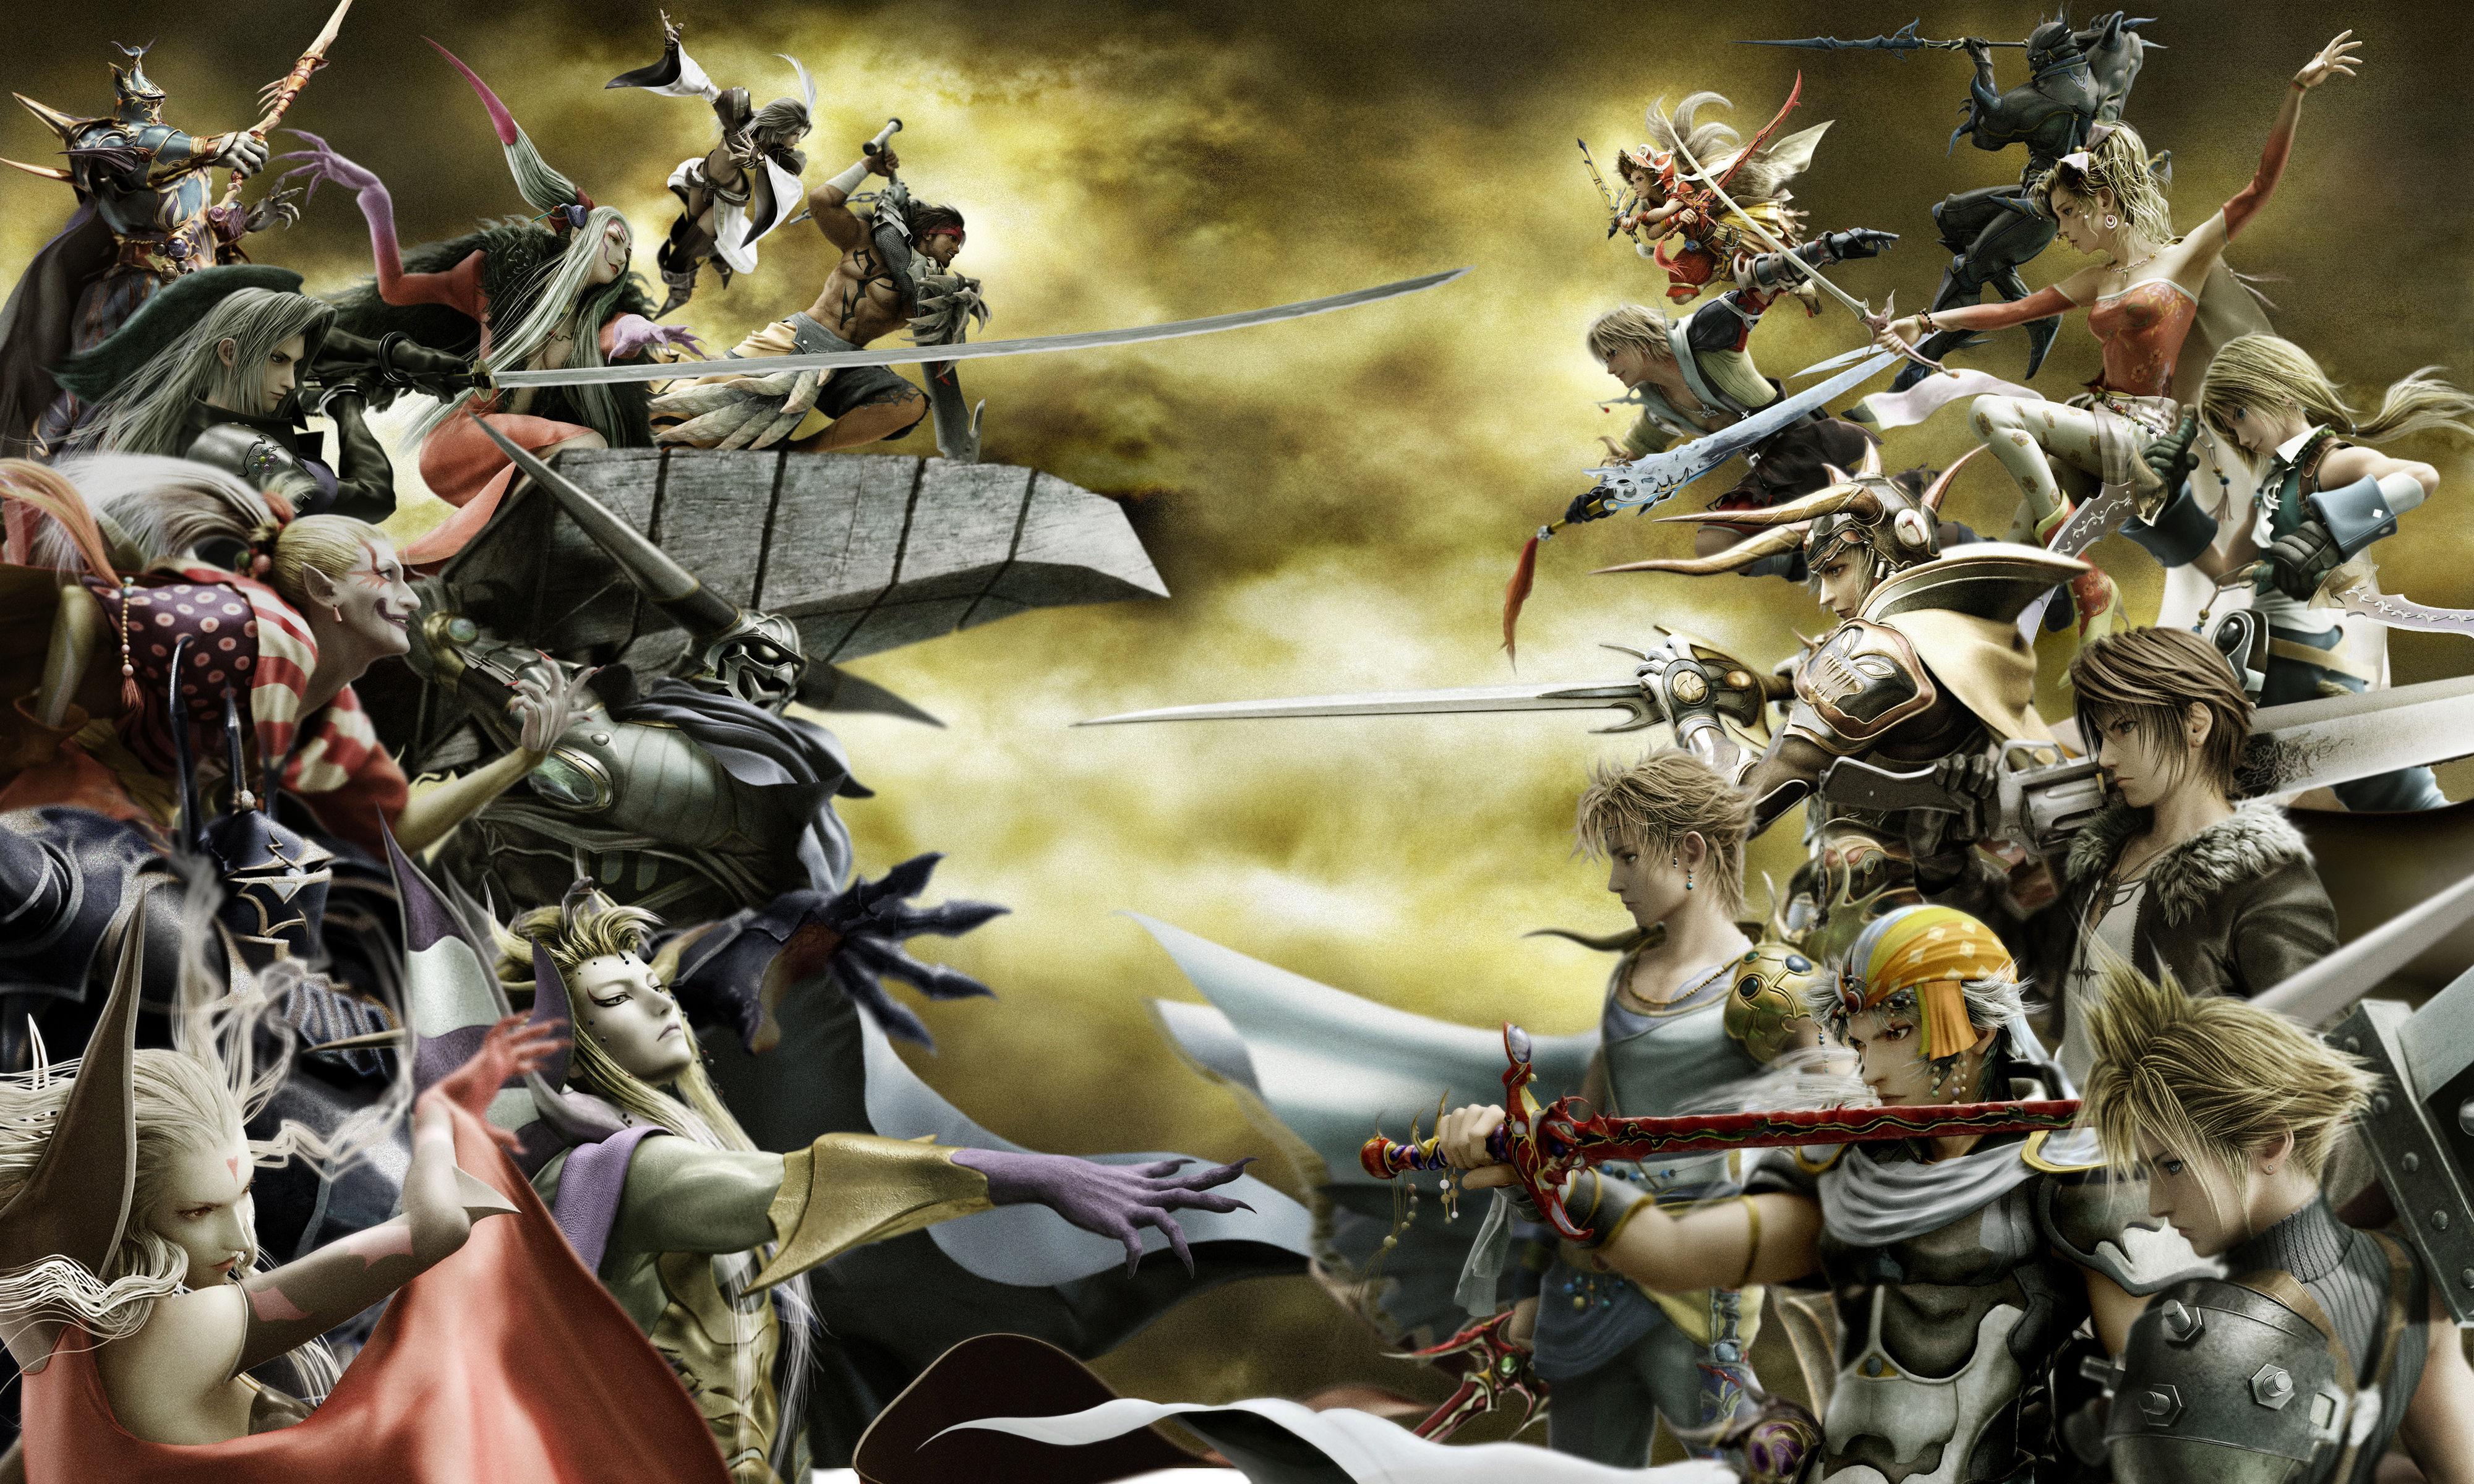 7704 - ¿Cuánto sabes de Final Fantasy? [Parte 1]